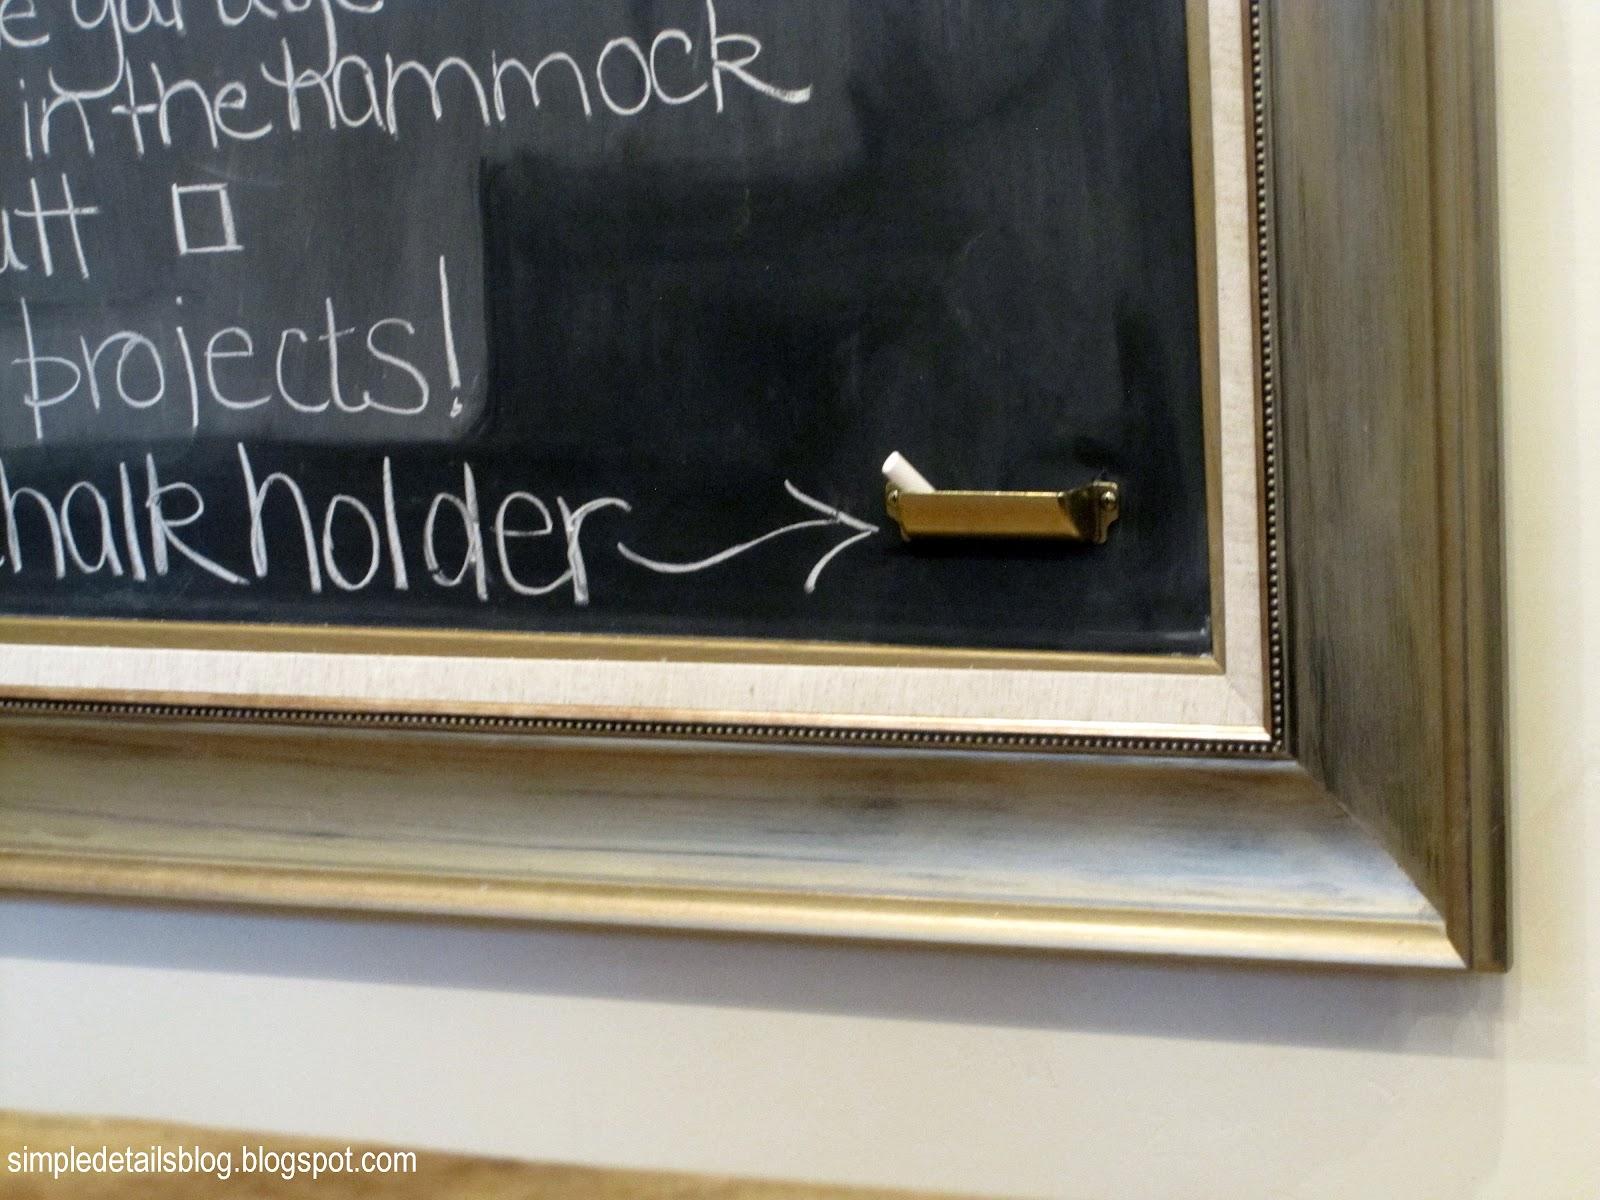 Chalkboard Chalk Holder | www.imgkid.com - The Image Kid ...